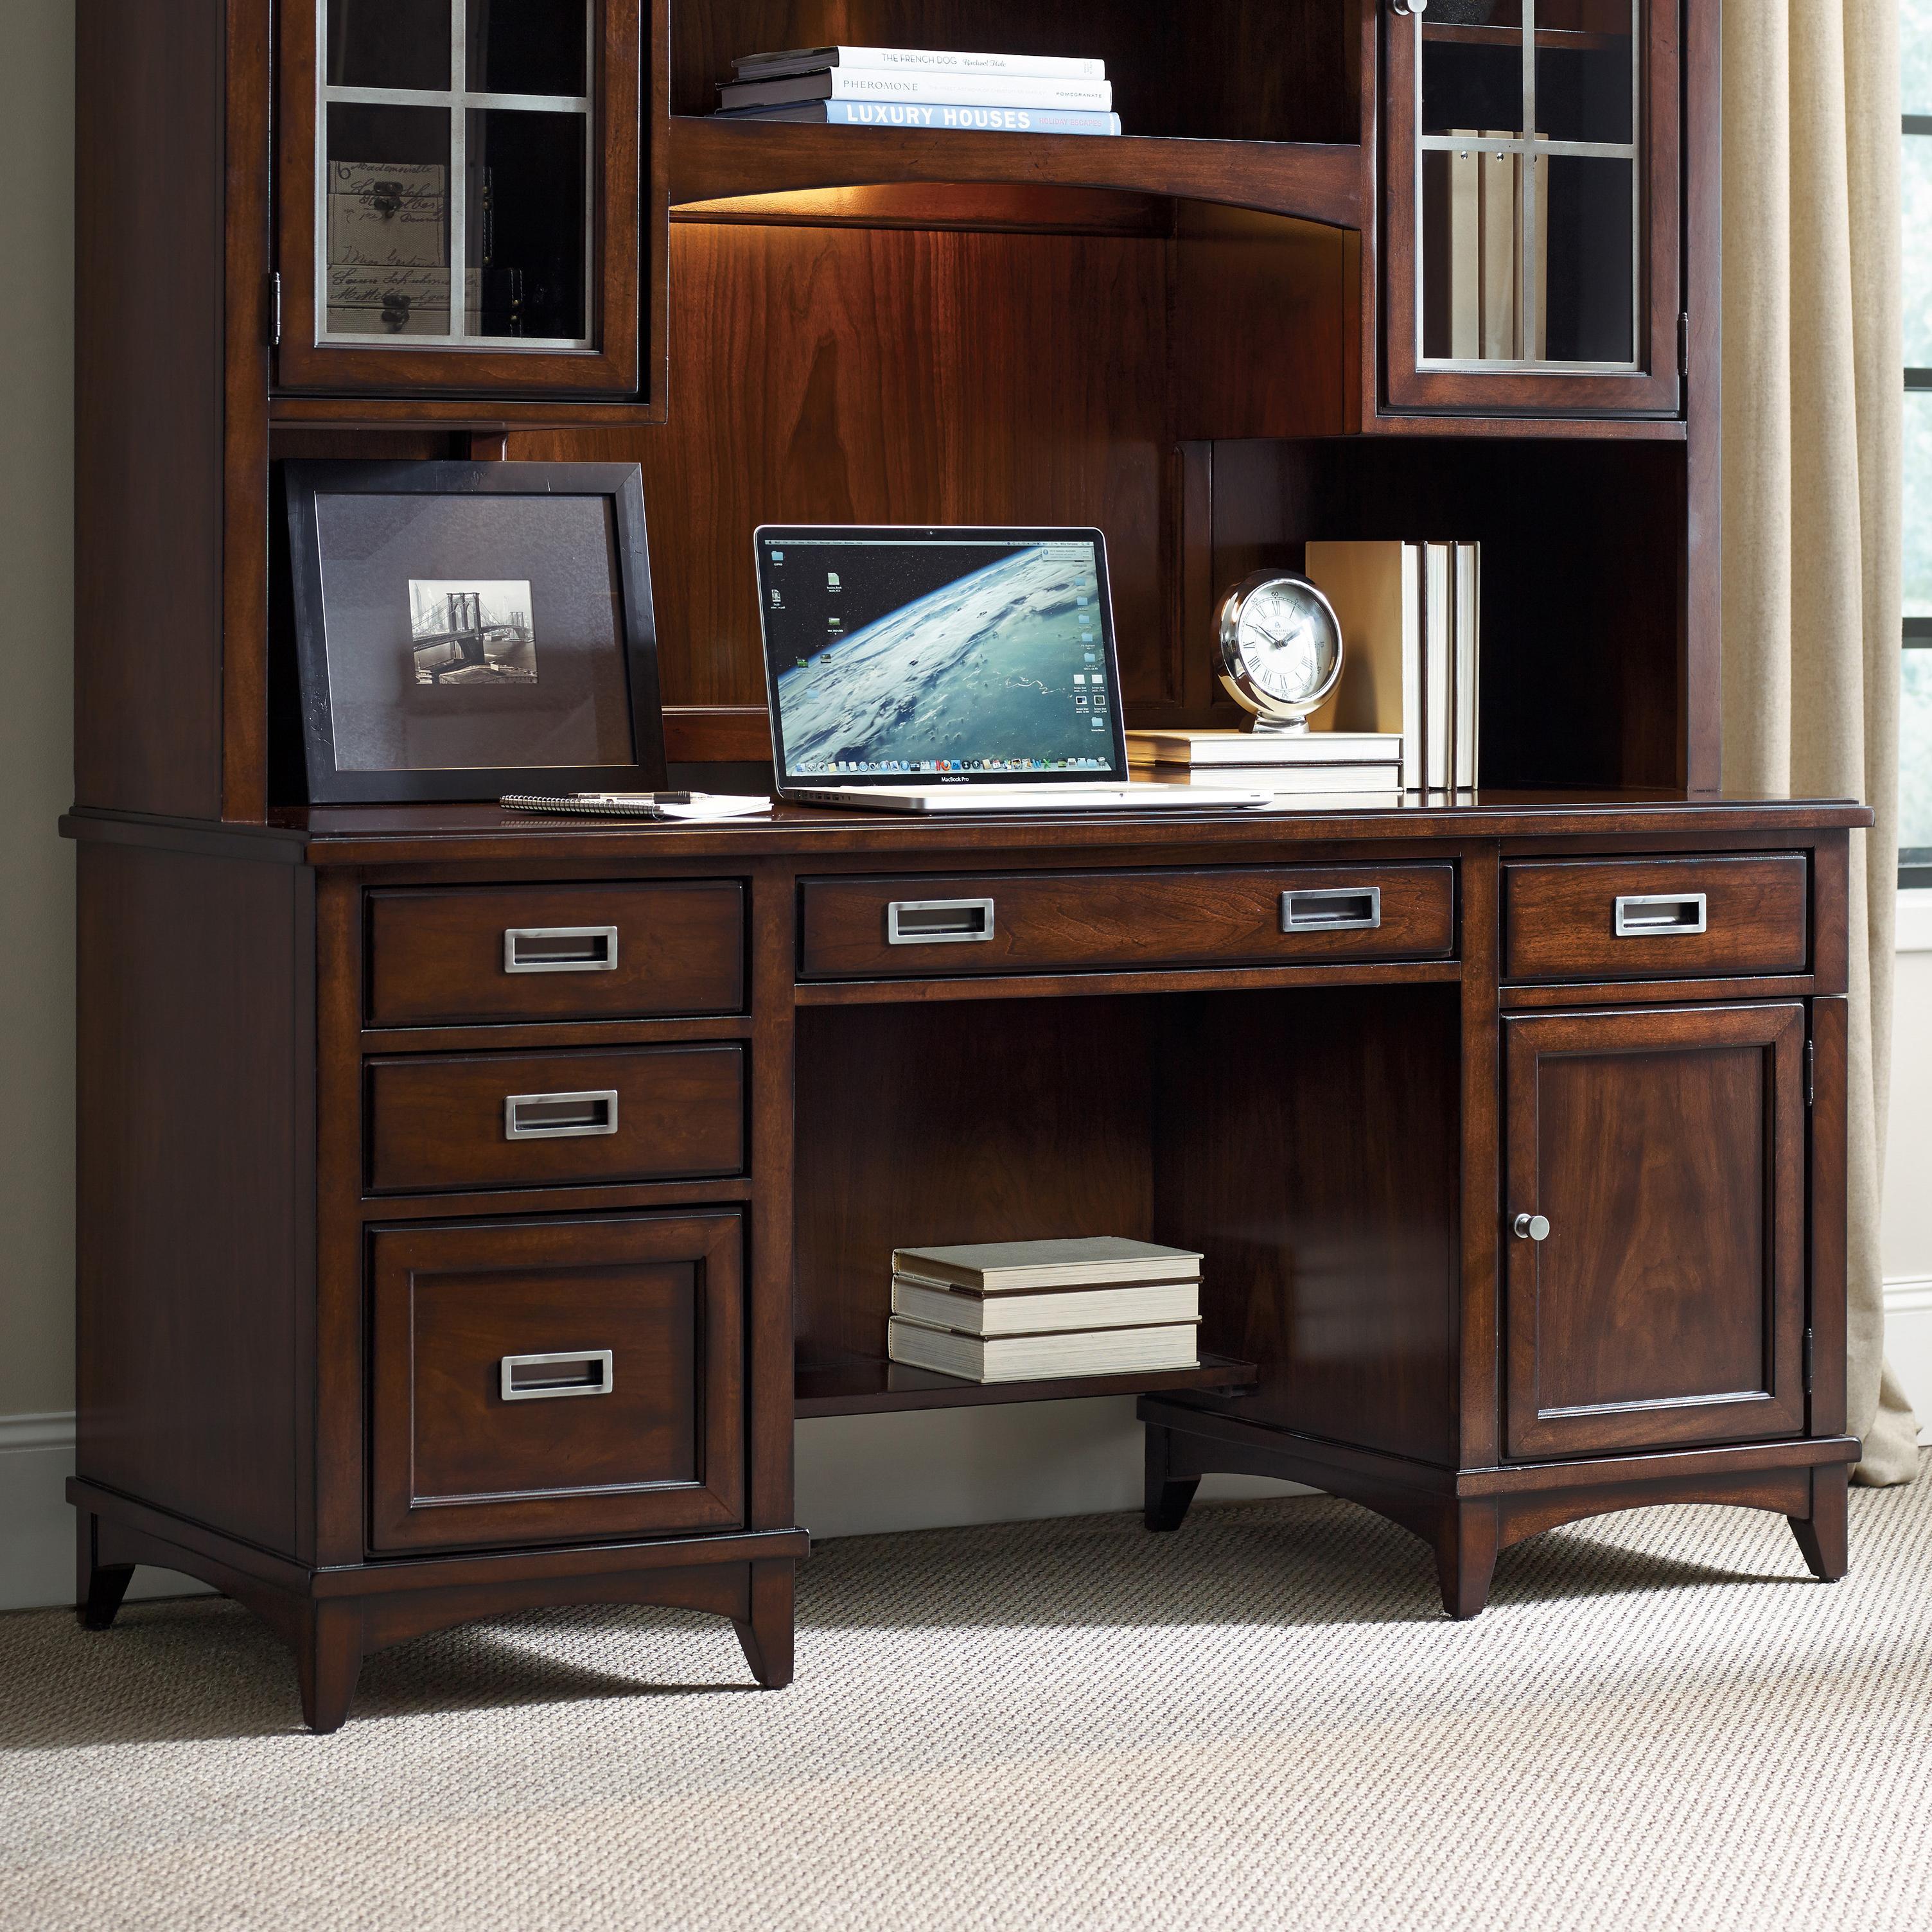 Latitude Computer Credenza by Hooker Furniture at Baer's Furniture